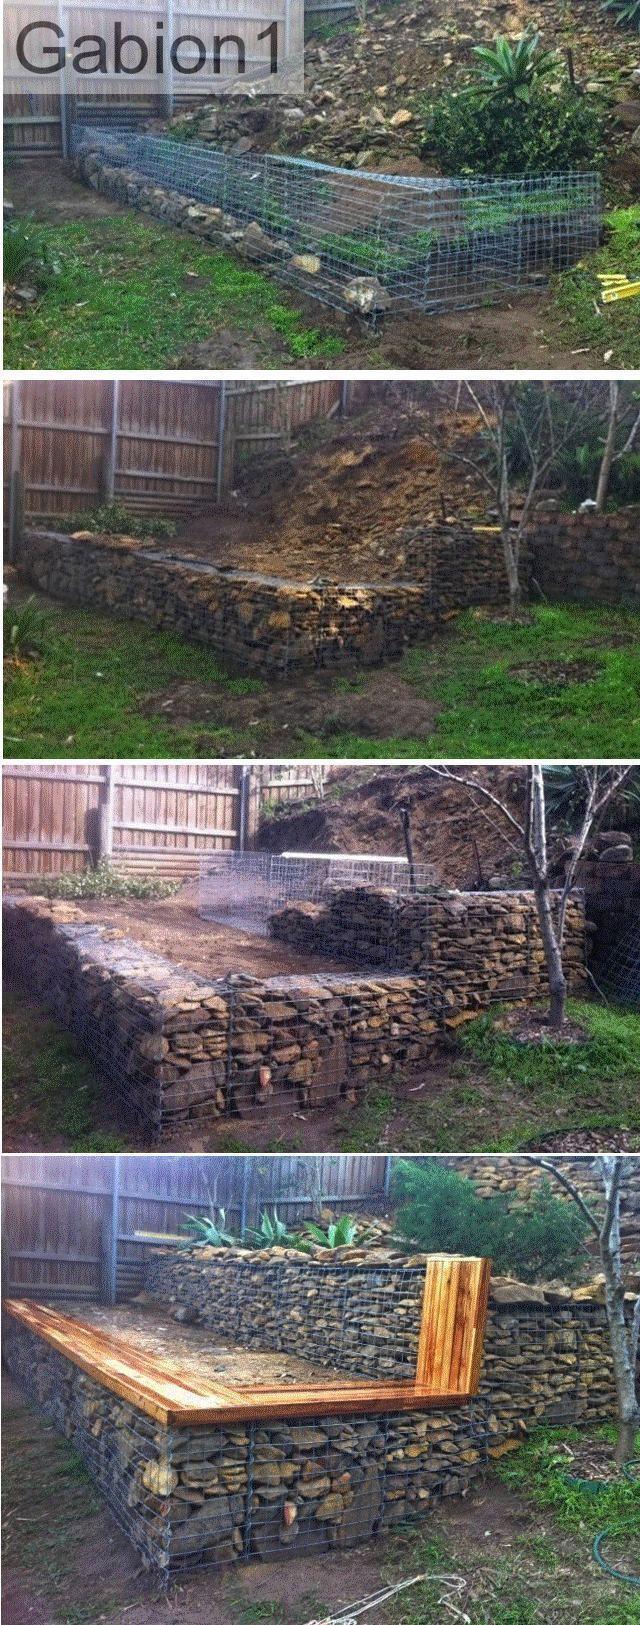 Gabion Retaining Wall : gabion garden retaining wall http://www.gabion1.com.au  Gabion ...